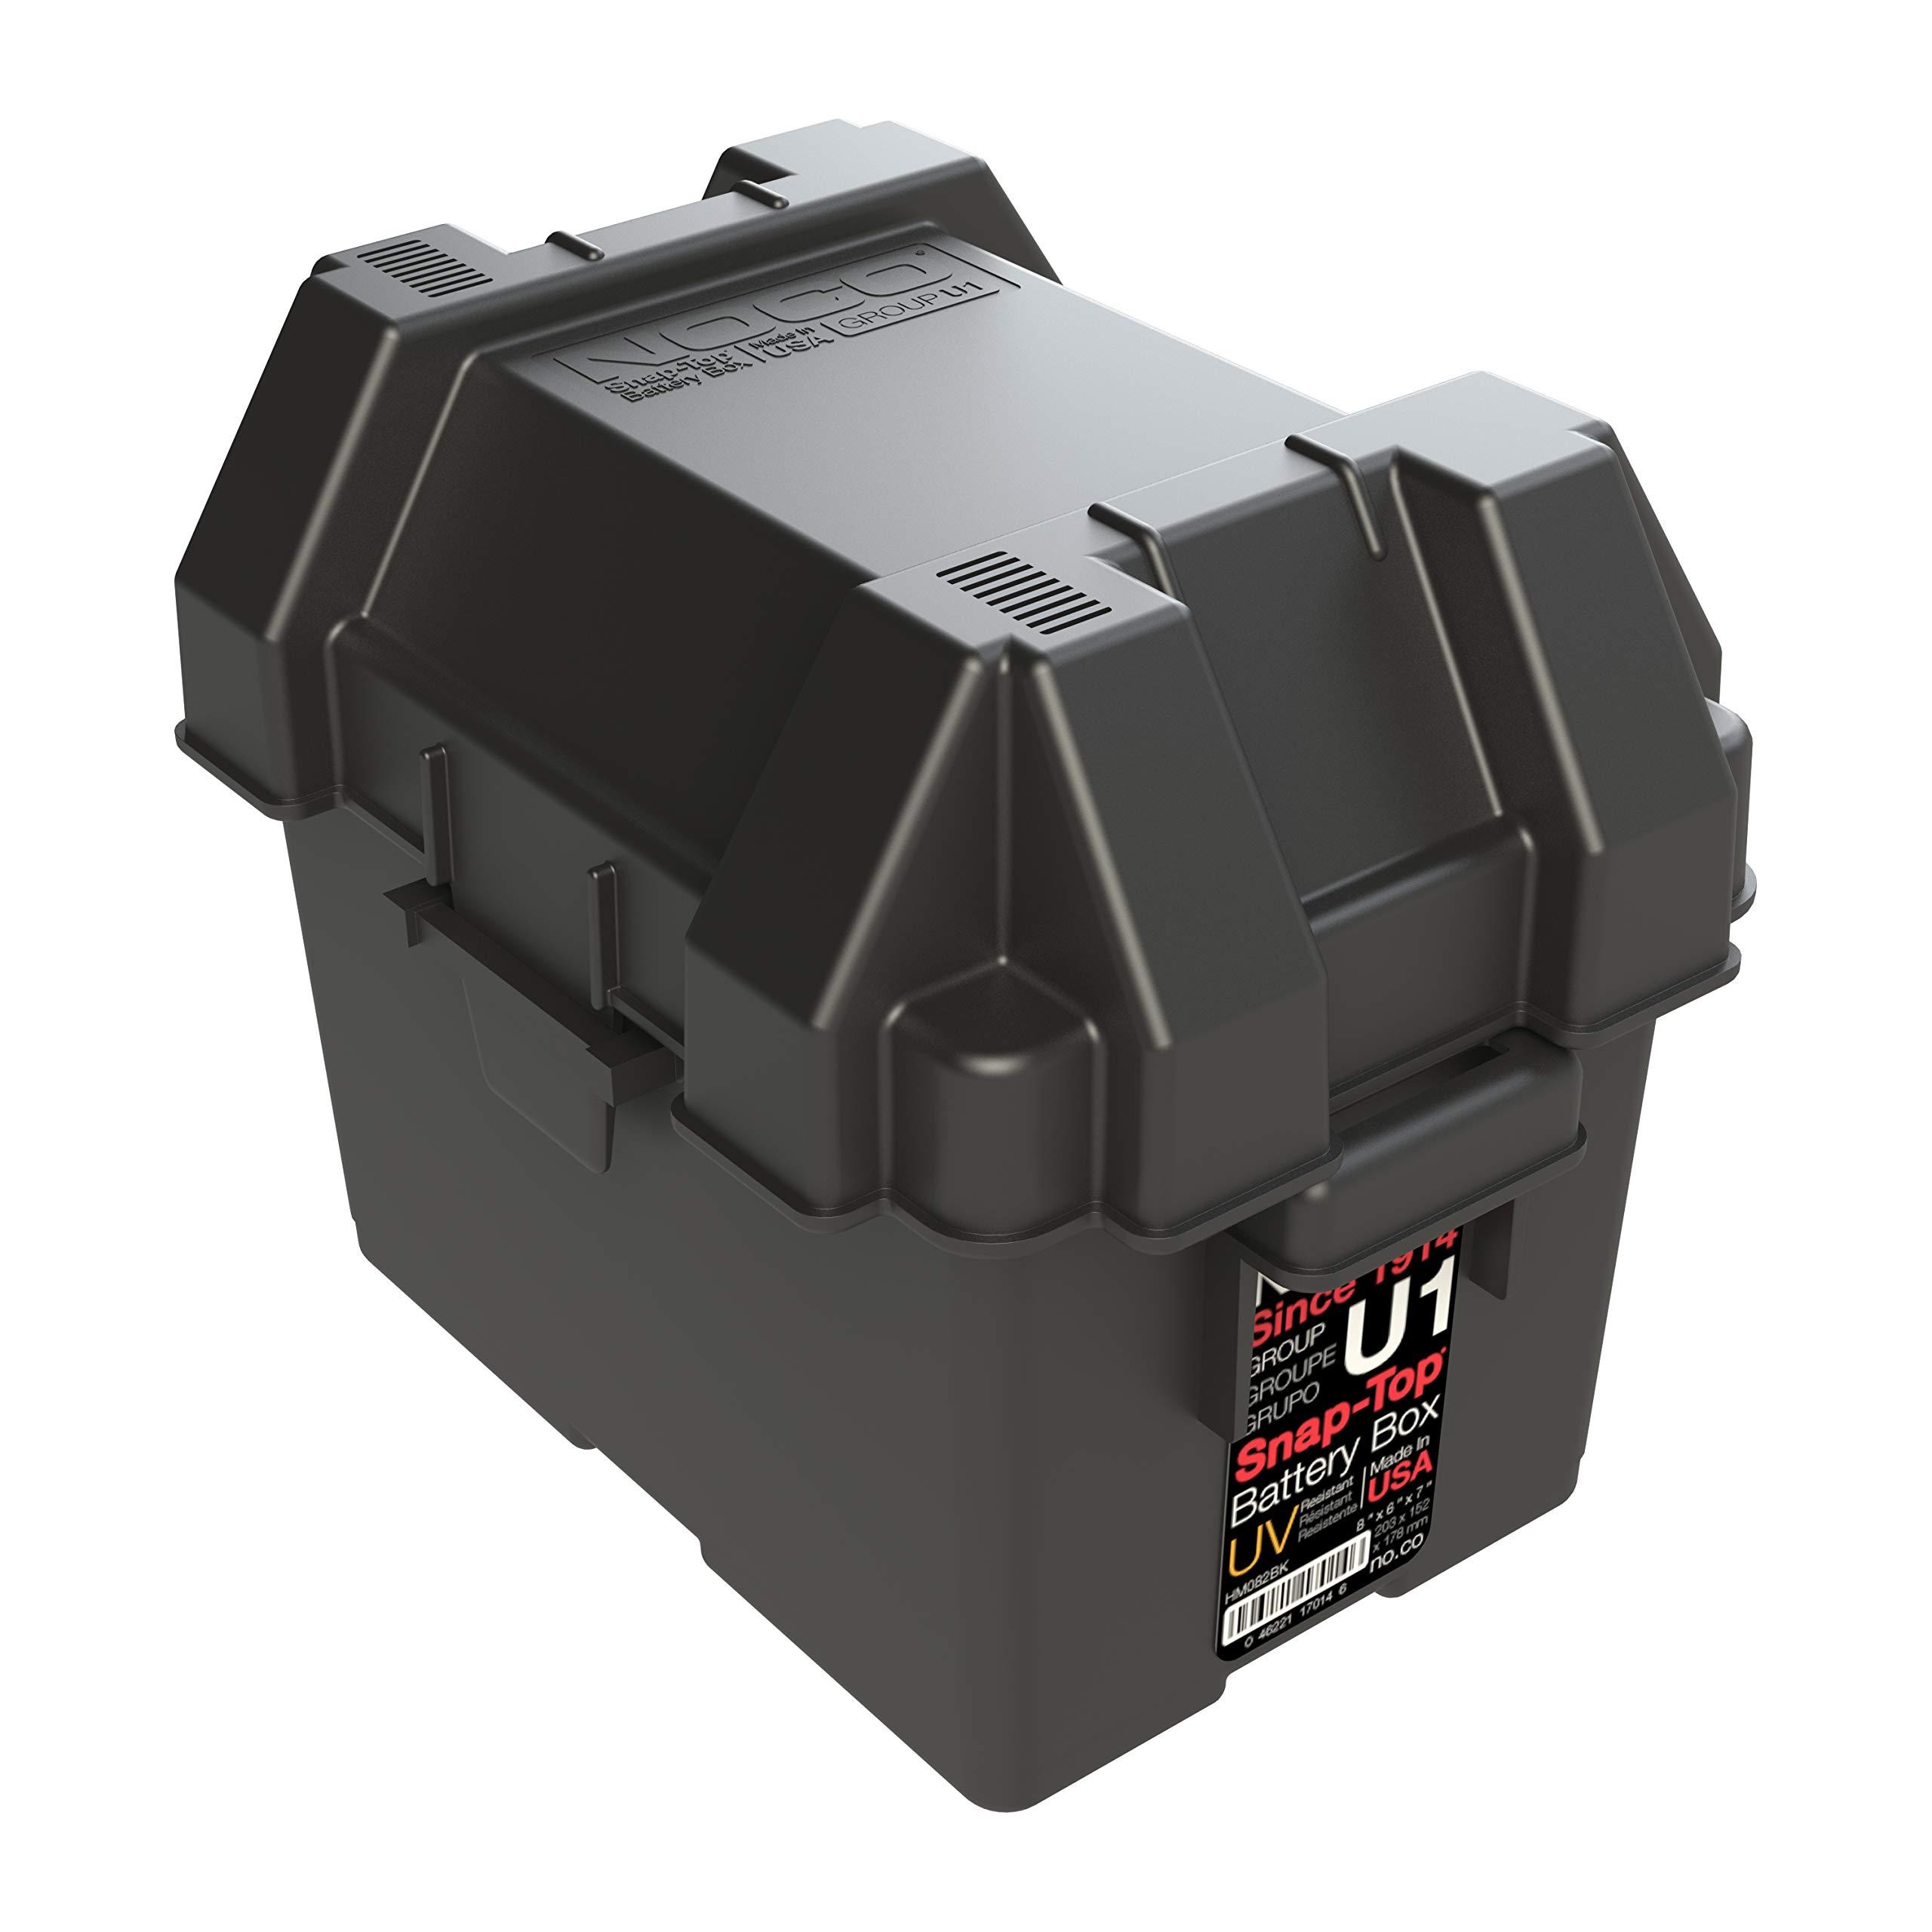 NOCO HM082BKS Group U1 Snap-Top Battery Box